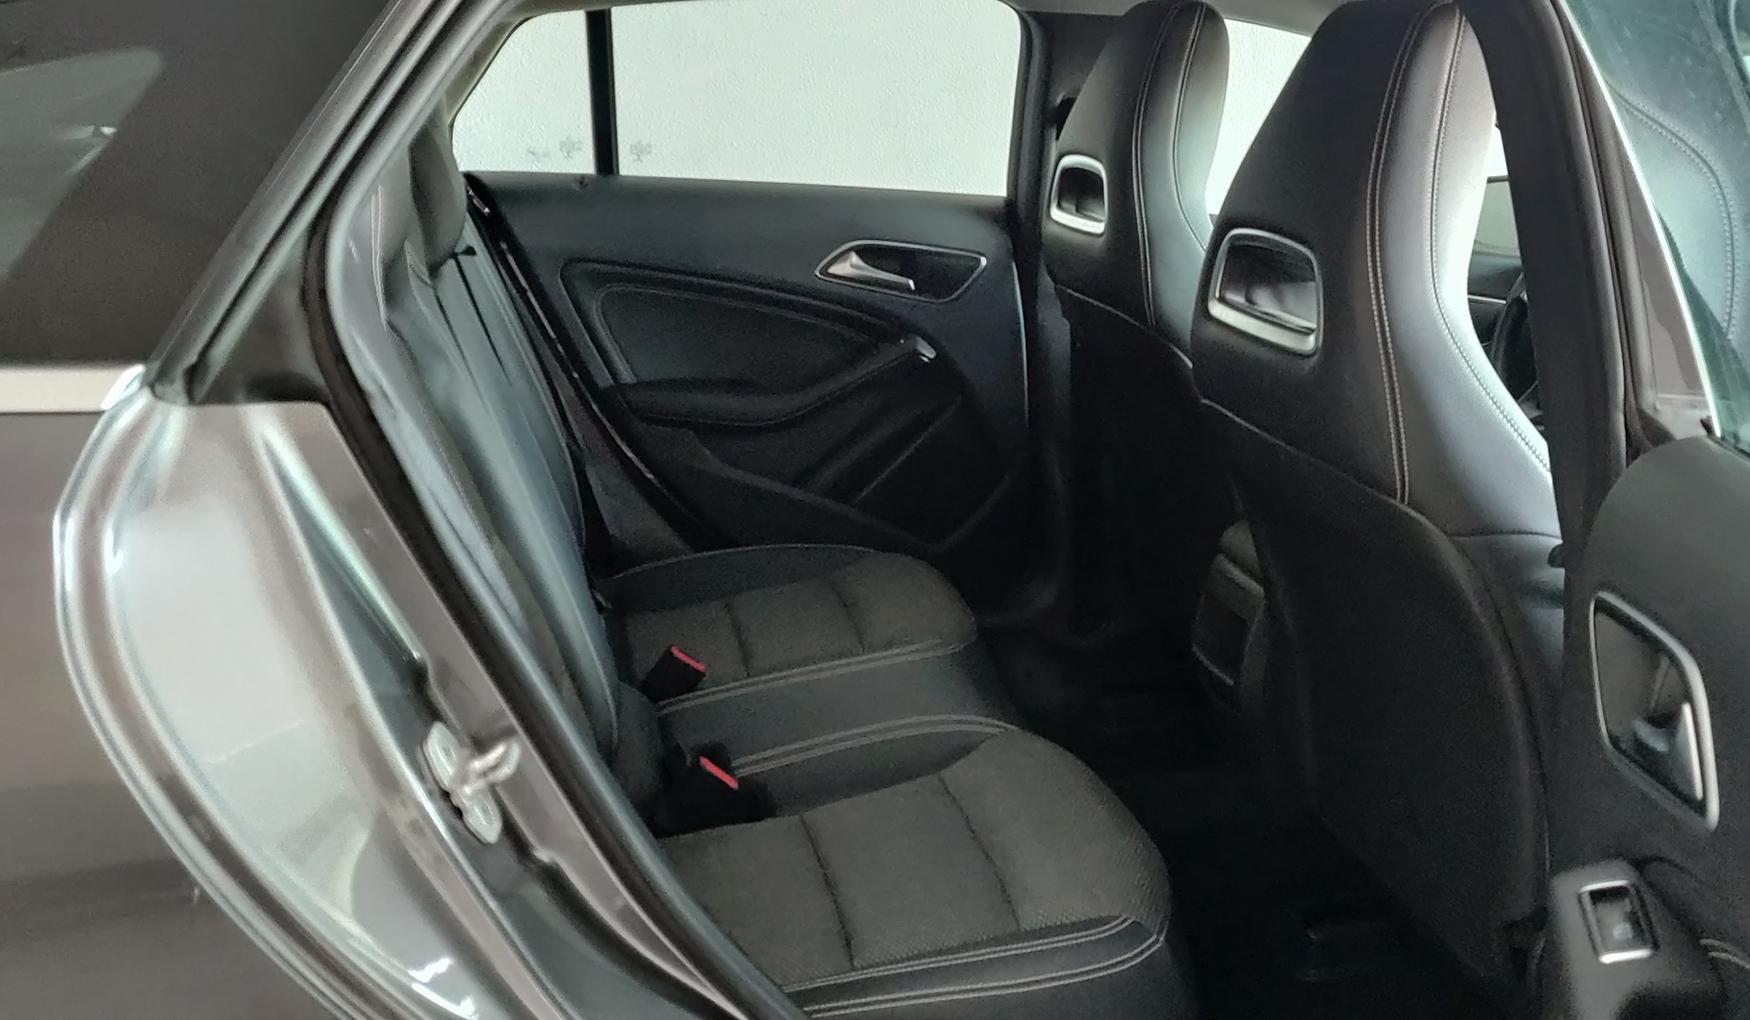 Mercedes-Benz CLA 180 1.5 Style | Imagem 6